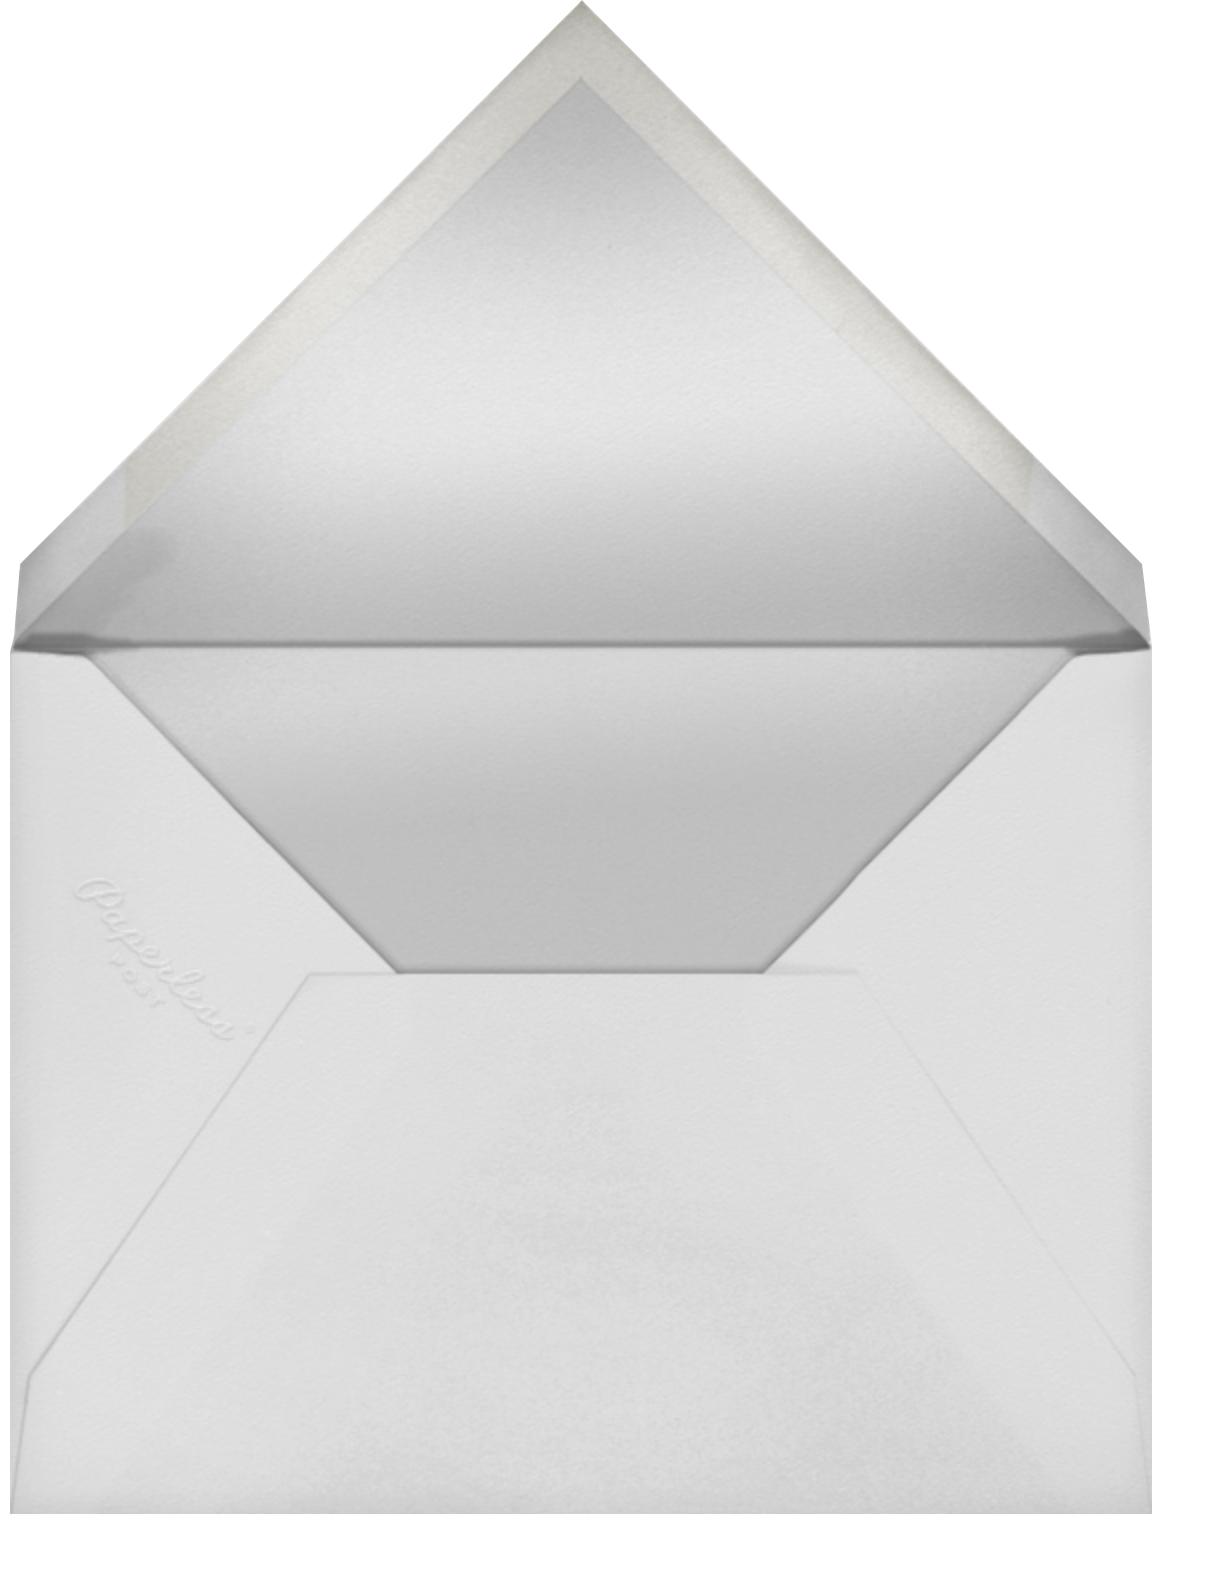 Lamina II (Menu) - Charcoal - Paperless Post - Envelope